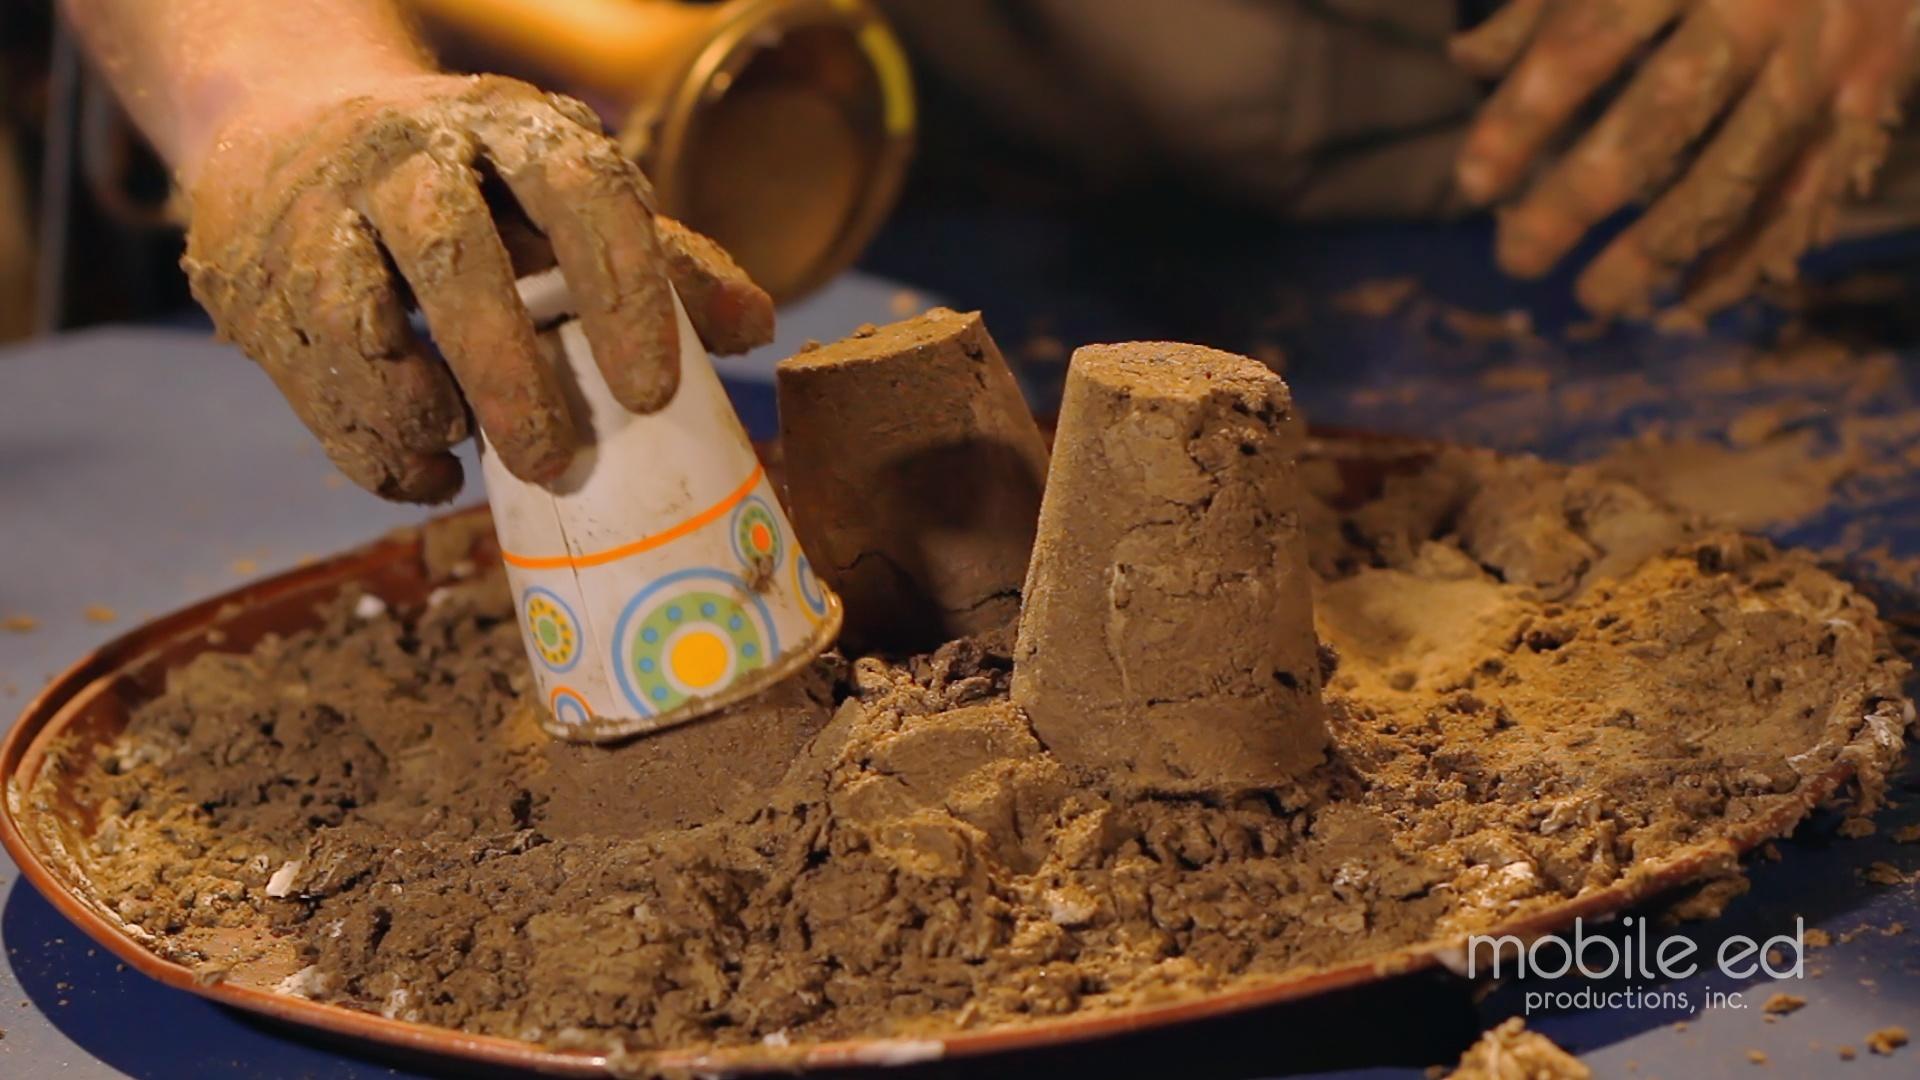 Make Sand Castles!   Handy Dan the Junkyard Man   Mobile Ed Productions